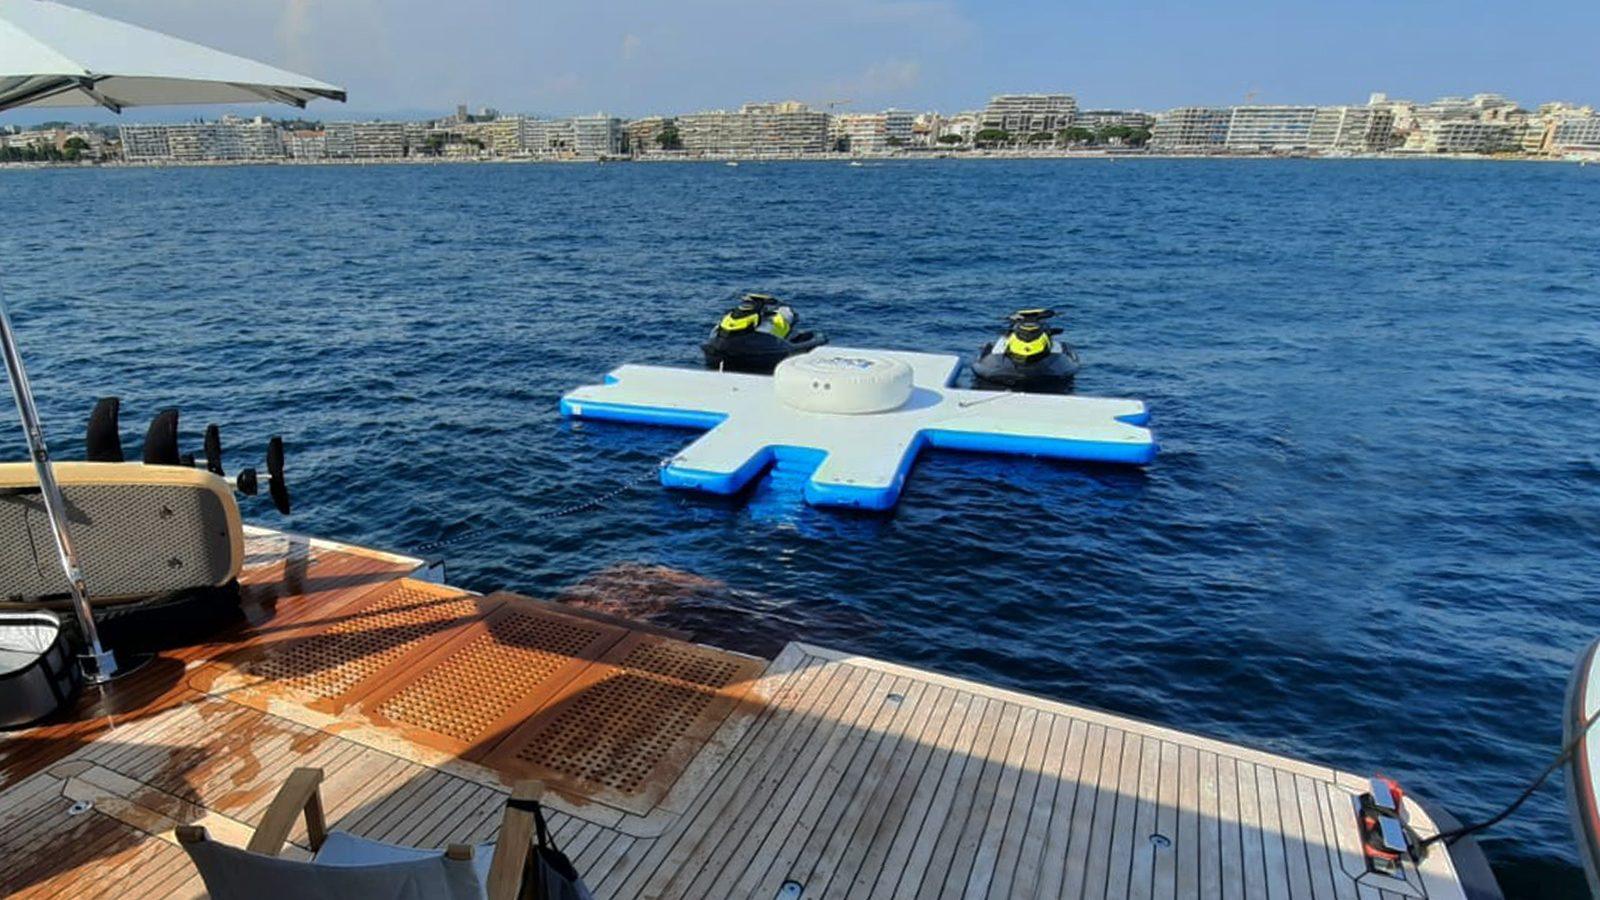 Toy Island with jet skis